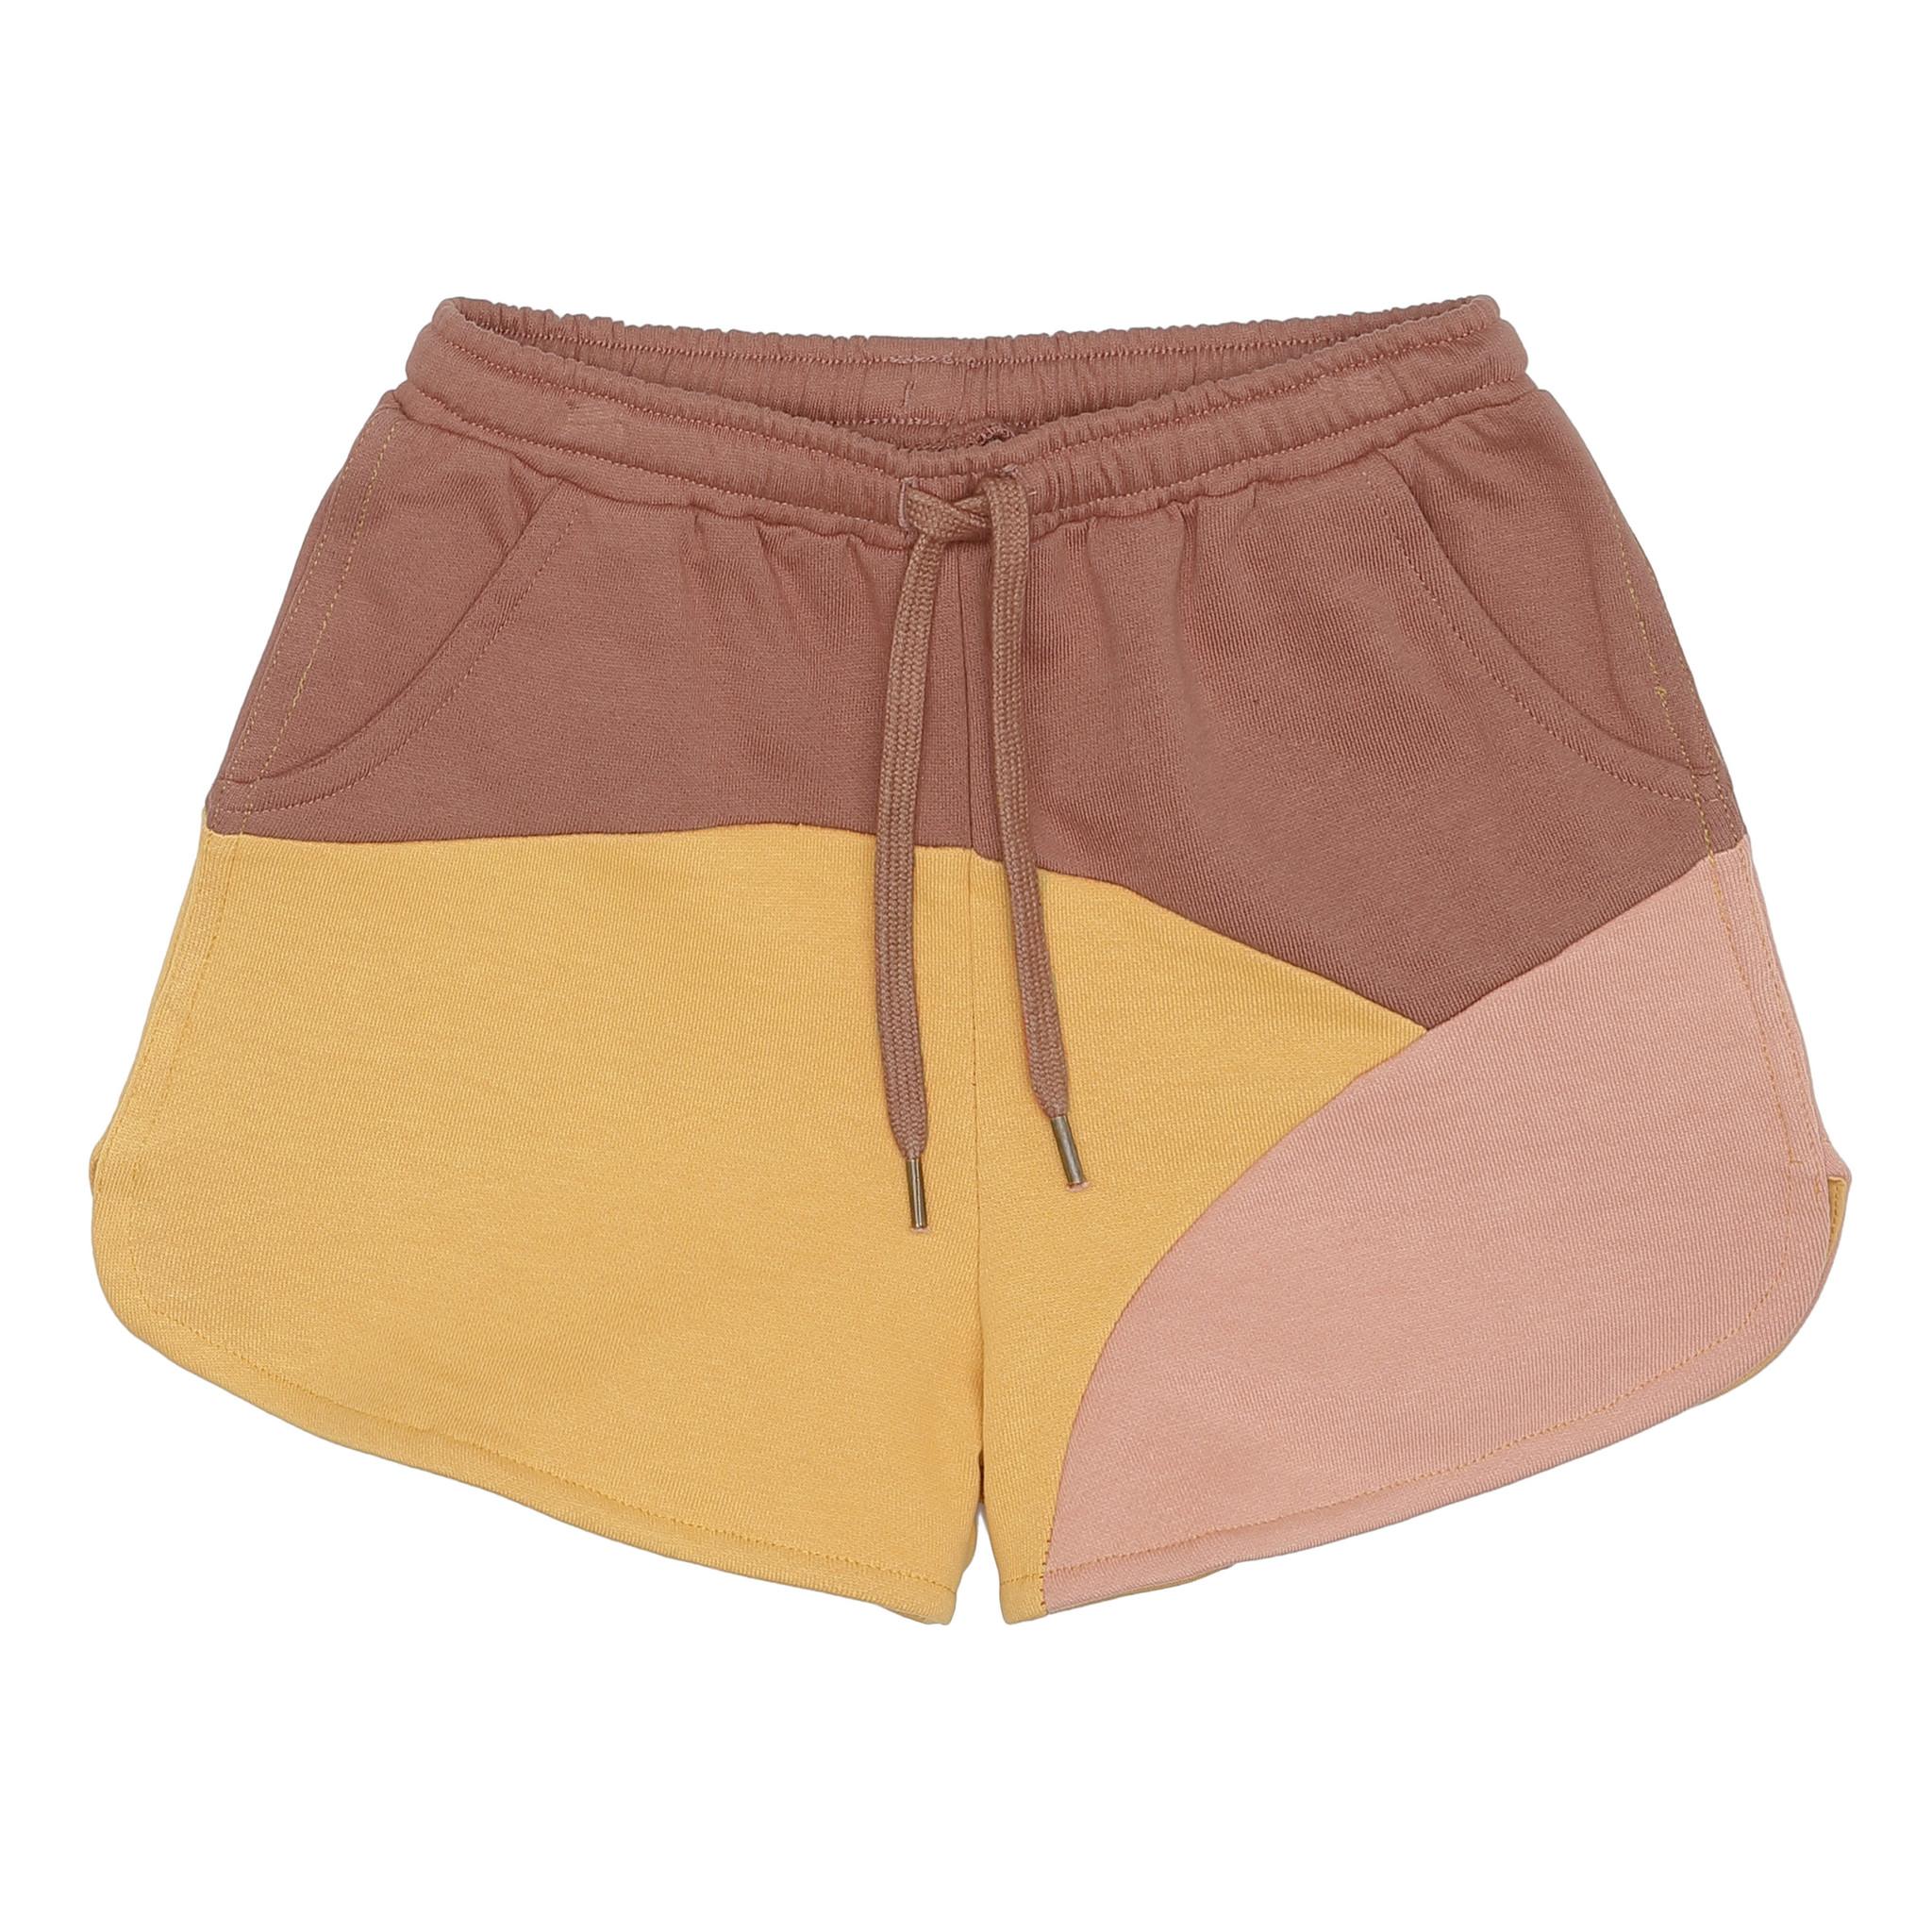 Paris shorts - Scenery Girl-1